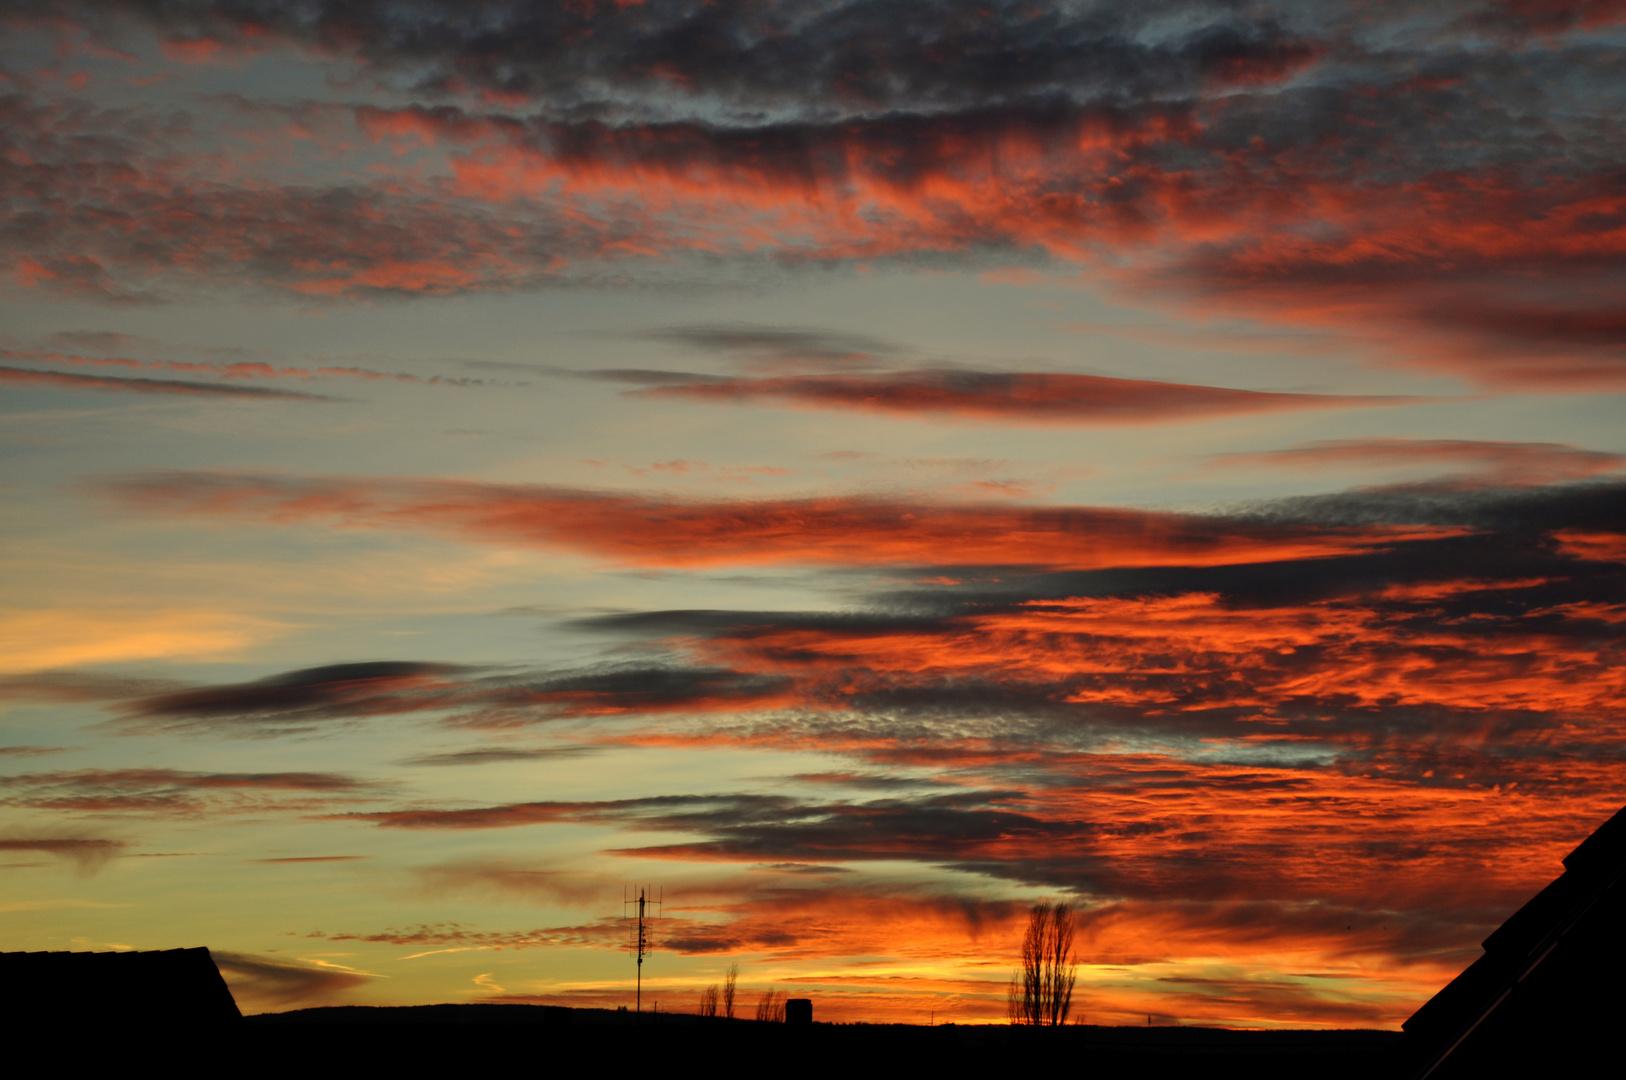 Fantastisch roter Sonnenuntergang im Winter